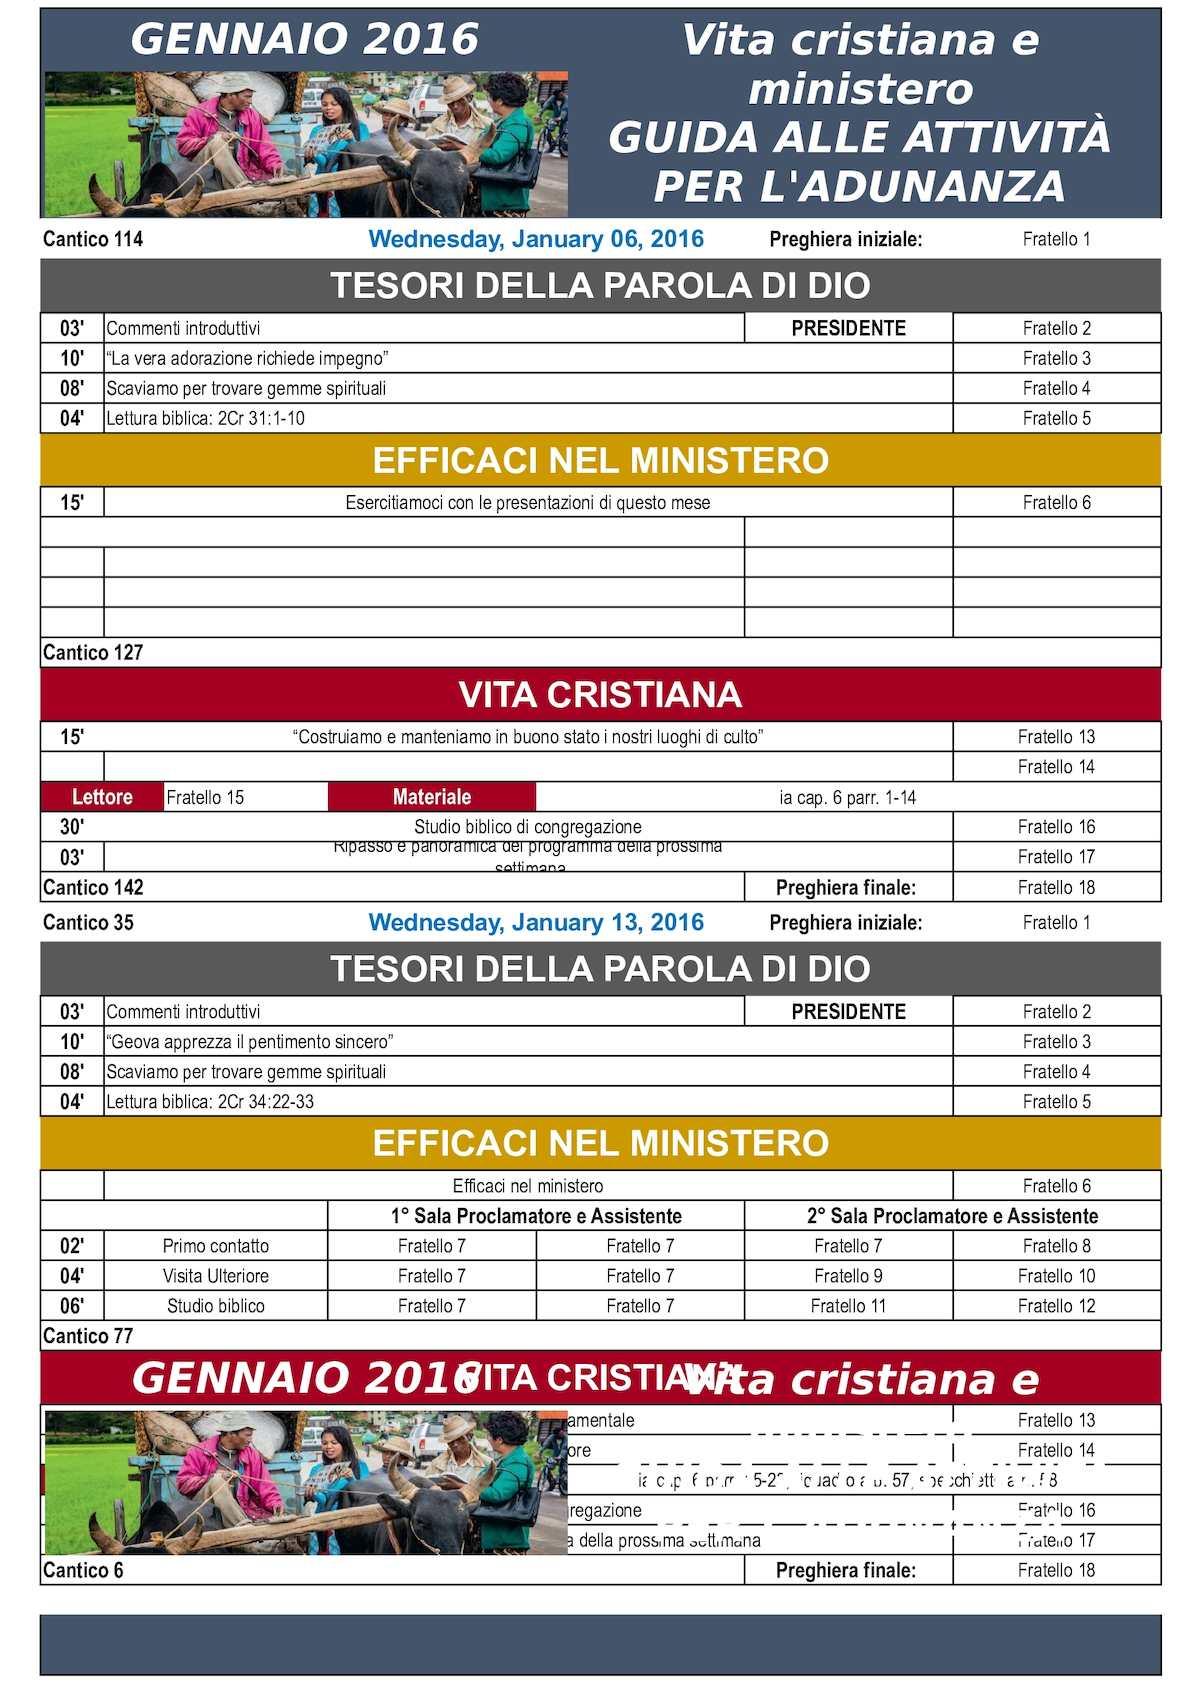 Programma Bacheca 2016 VIDA Y MINISTERIO CRISTIANOS